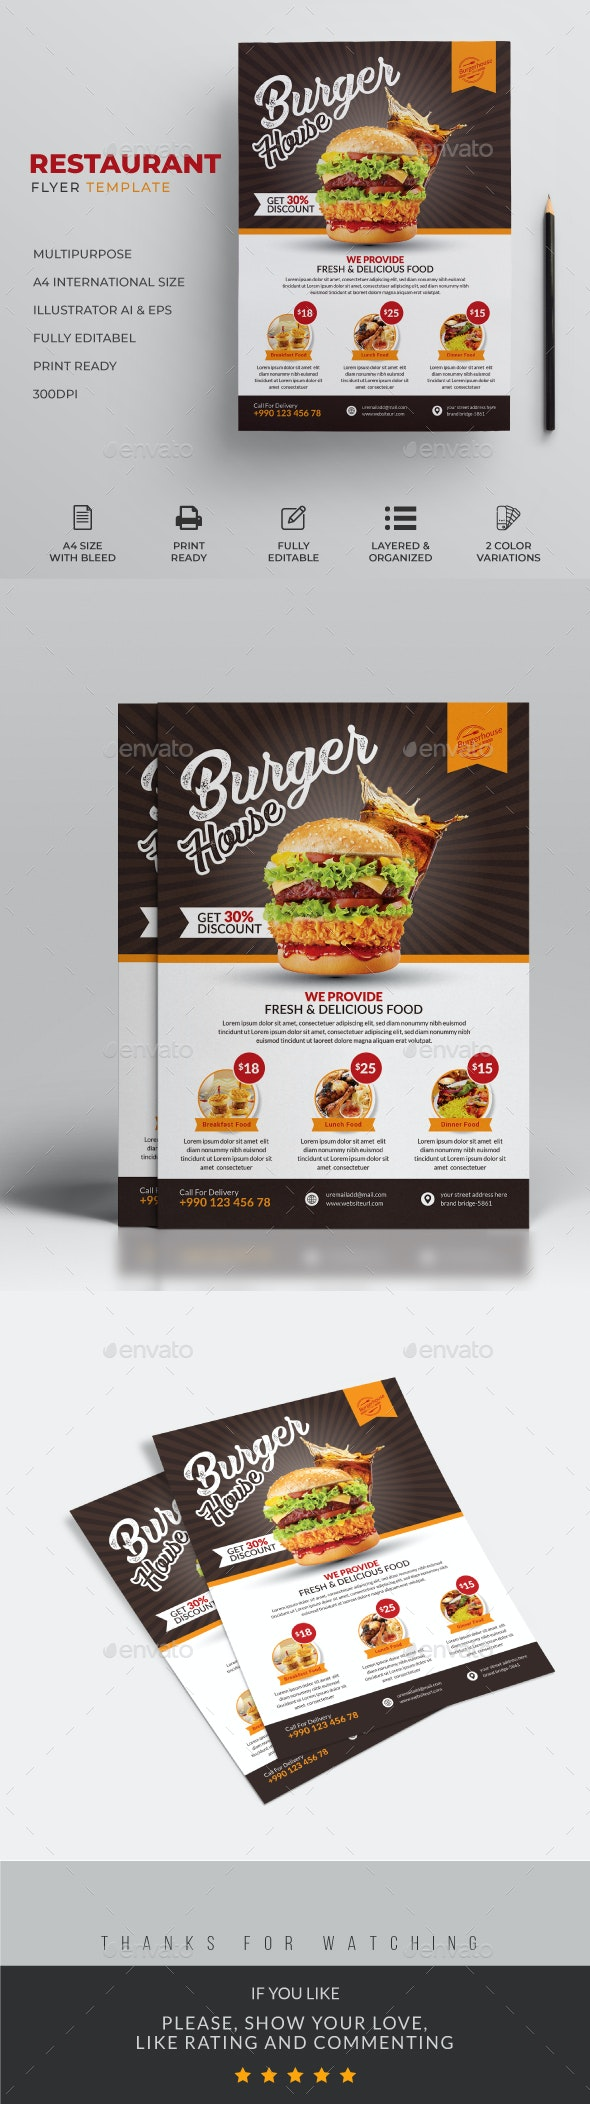 Food Flyer &  Restaurant Burger Flyer - Restaurant Flyers